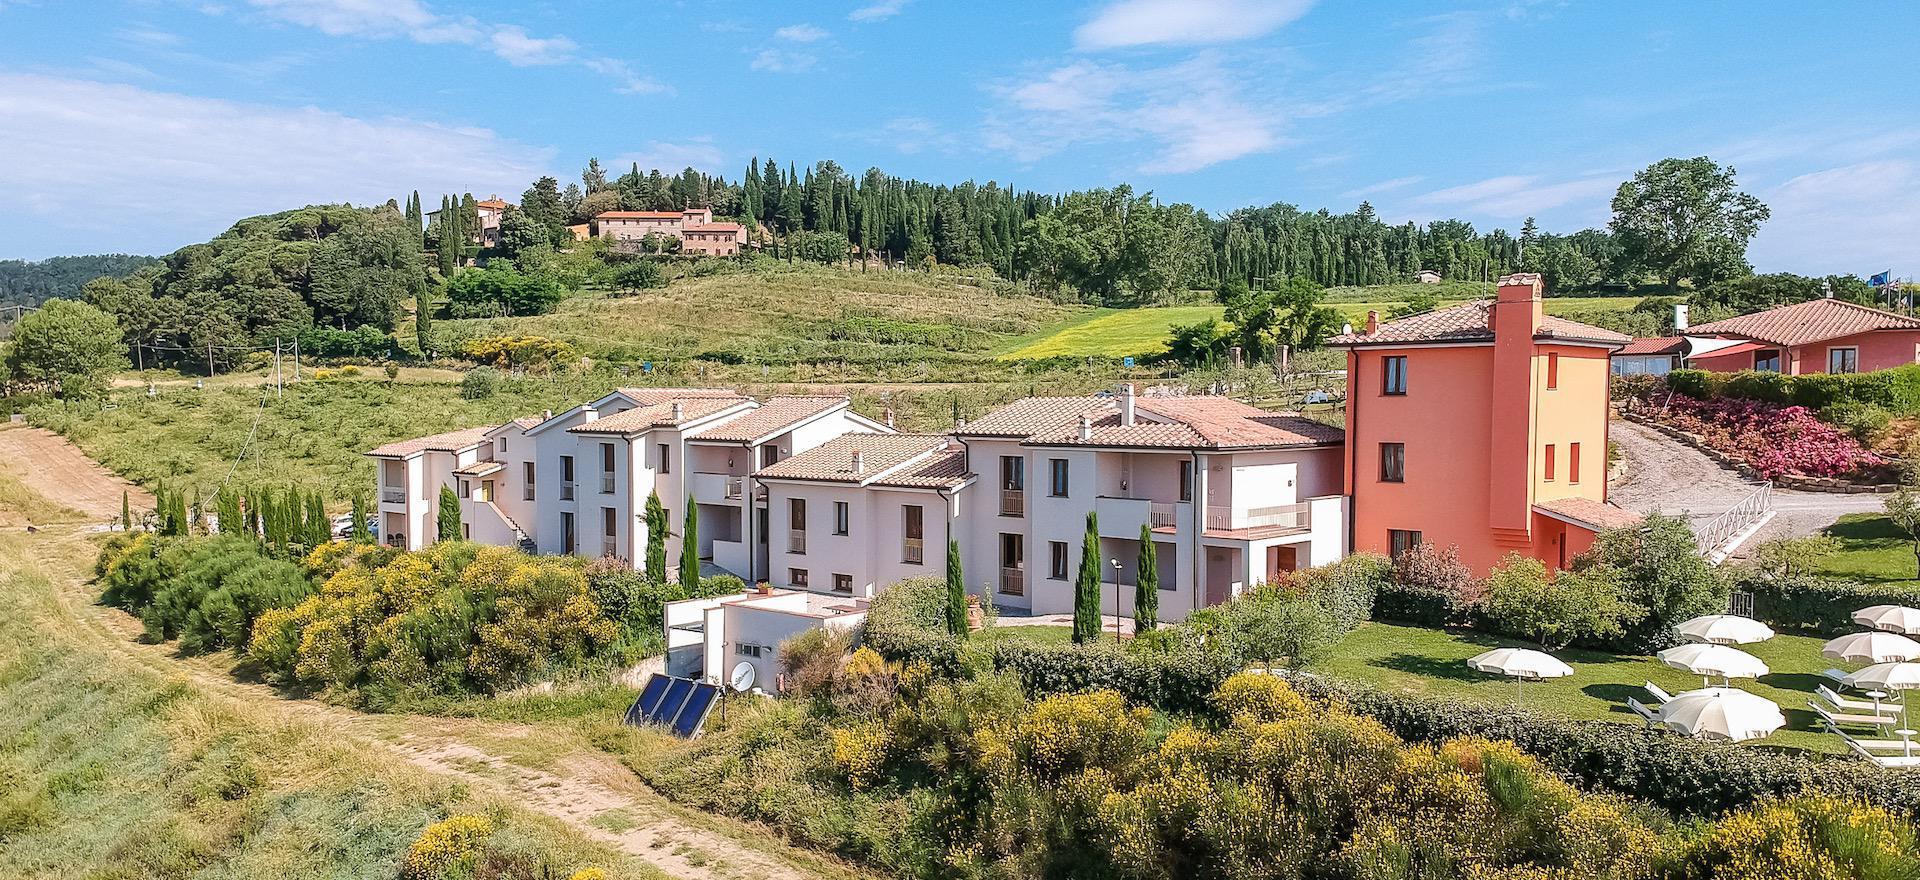 Agriturismo Toscana Grande agriturismo in Toscana con panorami mozzafiato